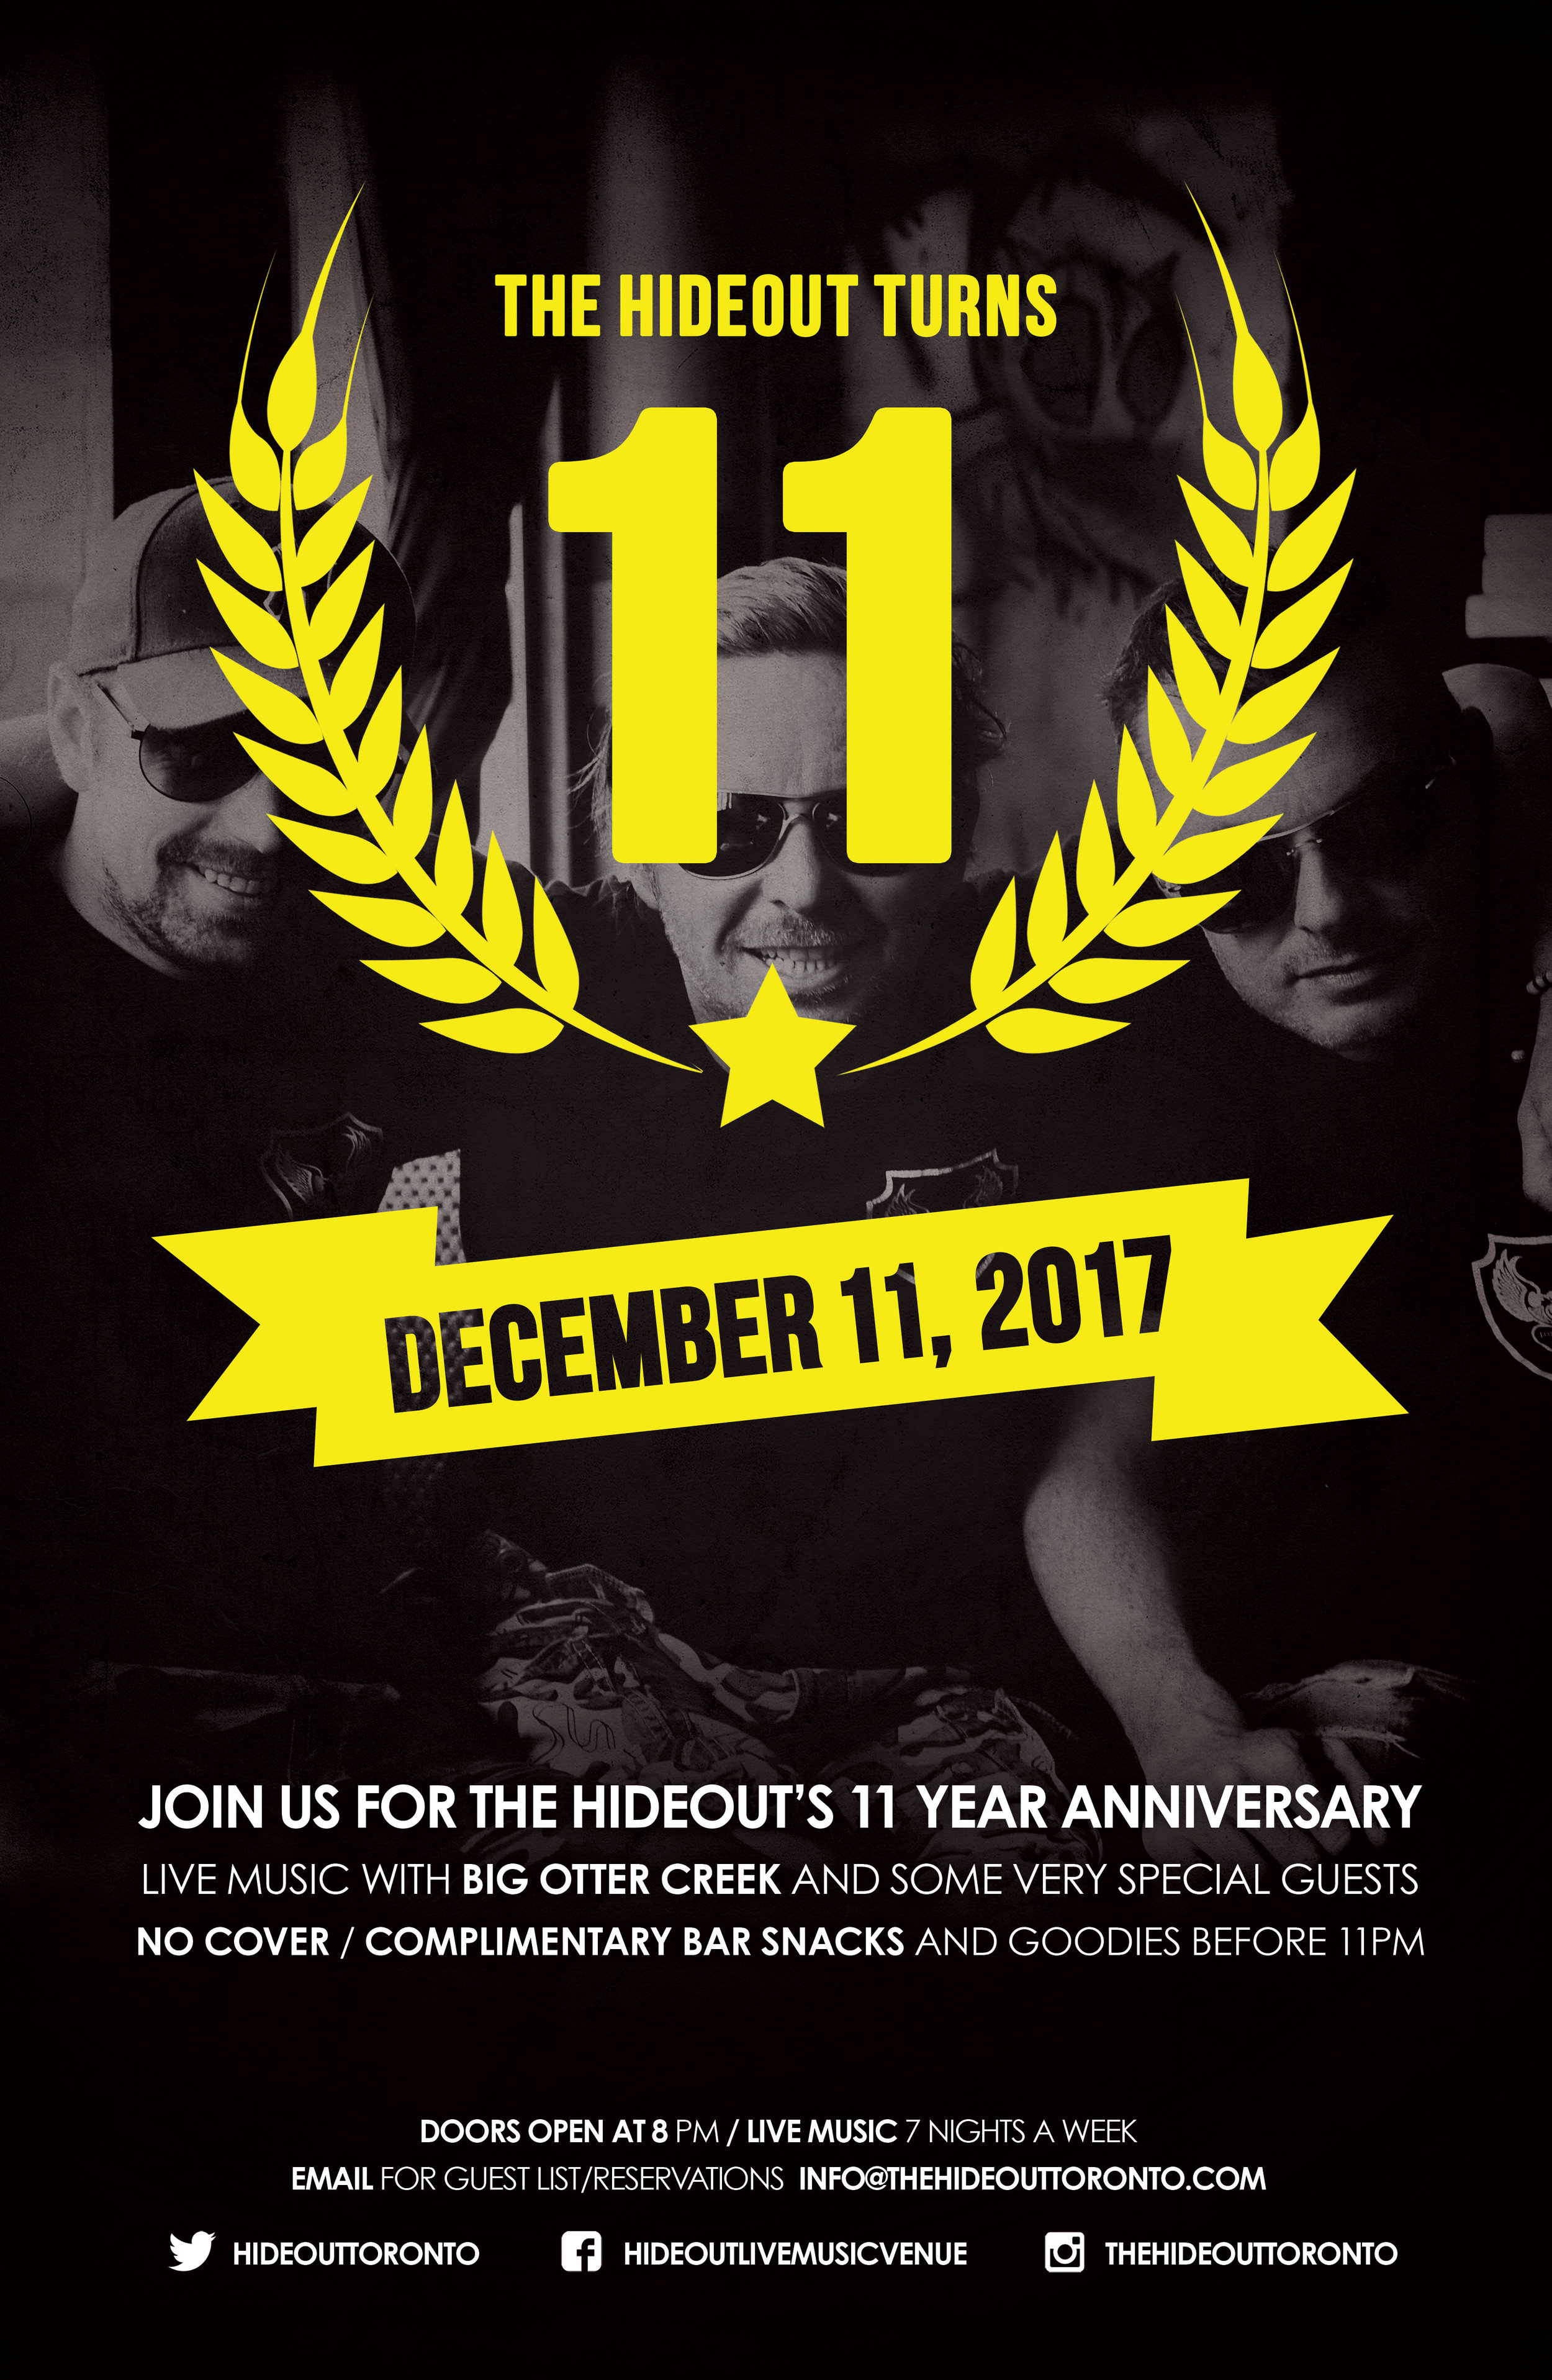 Hideout-Anniversary-11x17-72dpi.jpg